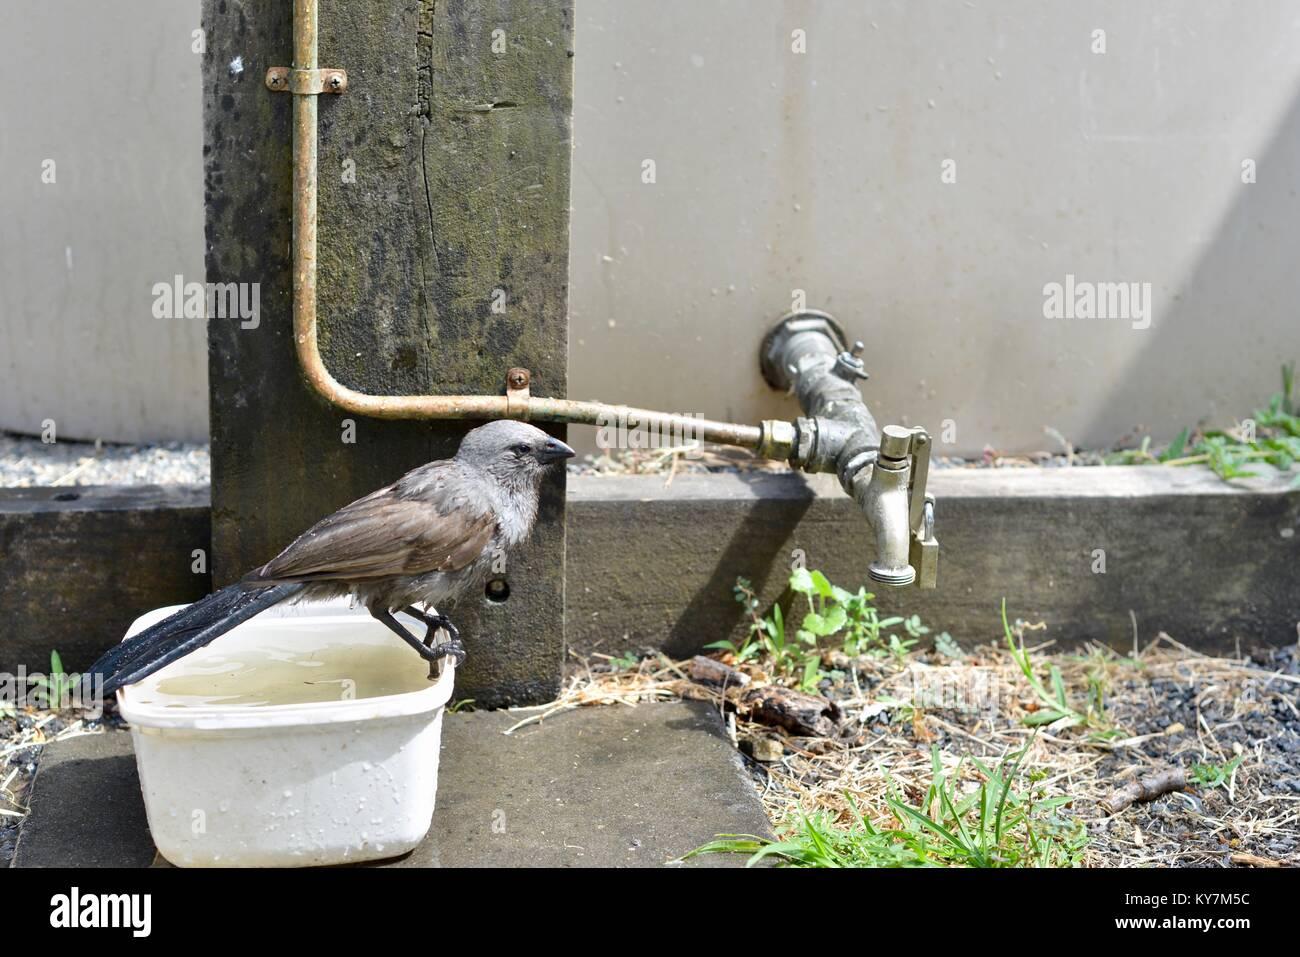 Apostlebirds (Struthidea cinerea) enjoying a bath and drink during a heatwave, Queensland, Australia - Stock Image